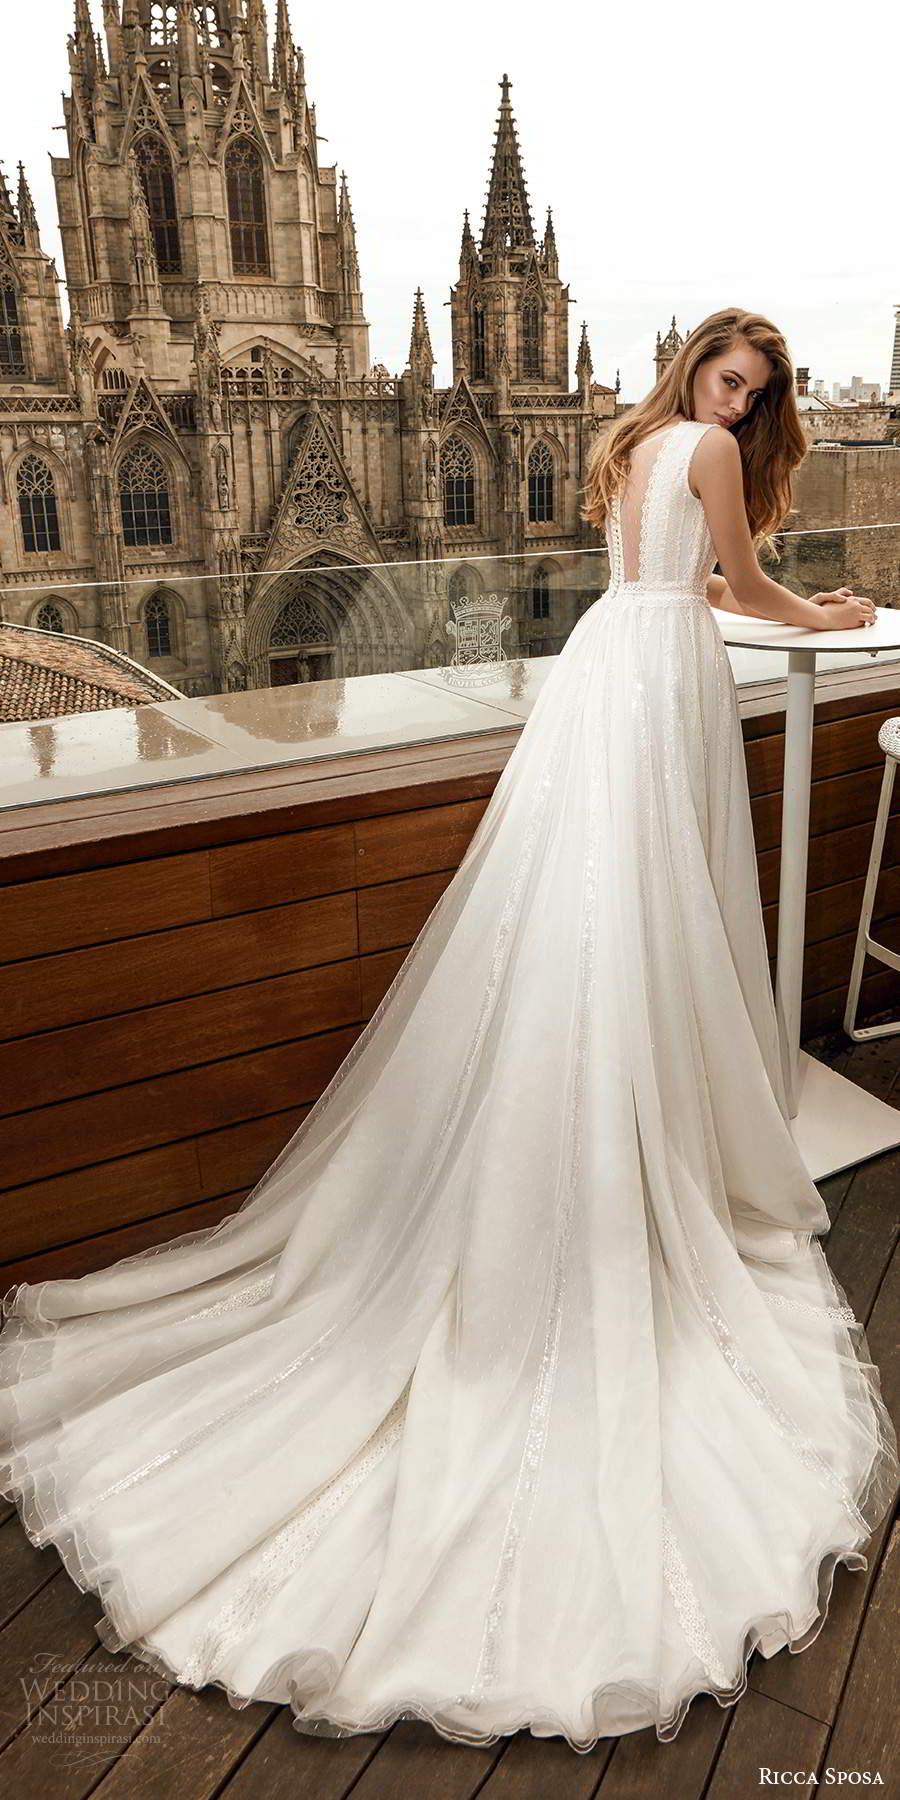 ricca sposa 2020 barcelona bridal sleeveless bateau neckline illusion embellished bodice a line boho a line ball gown wedding dress chapel train (19) bv